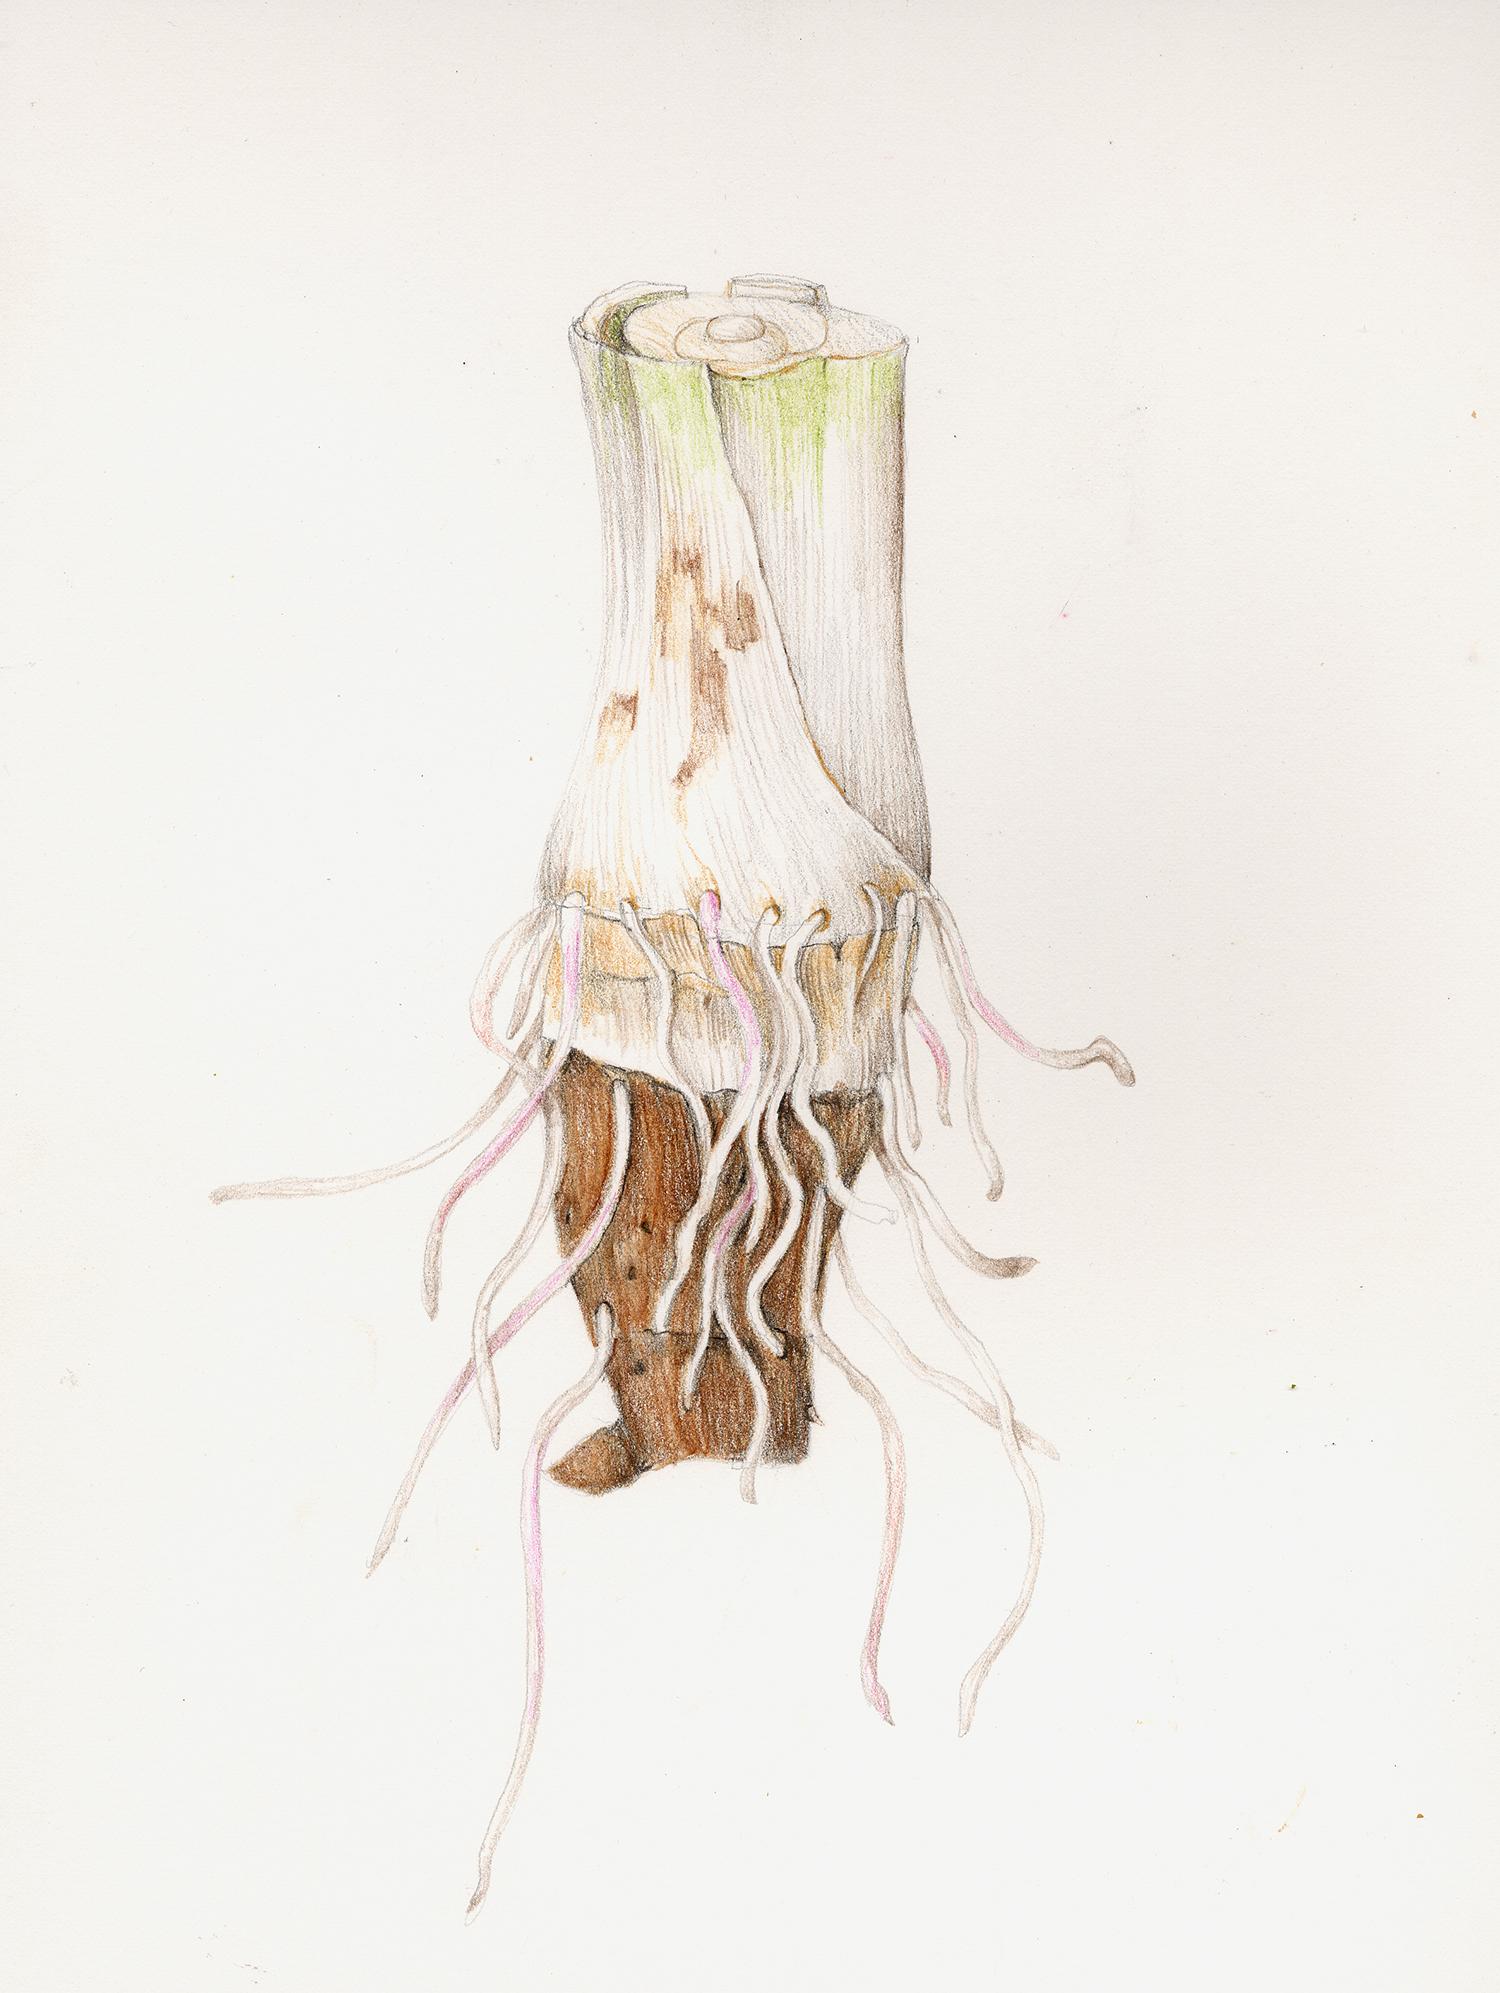 Kalo/Taro Root - Colocasia esculenta